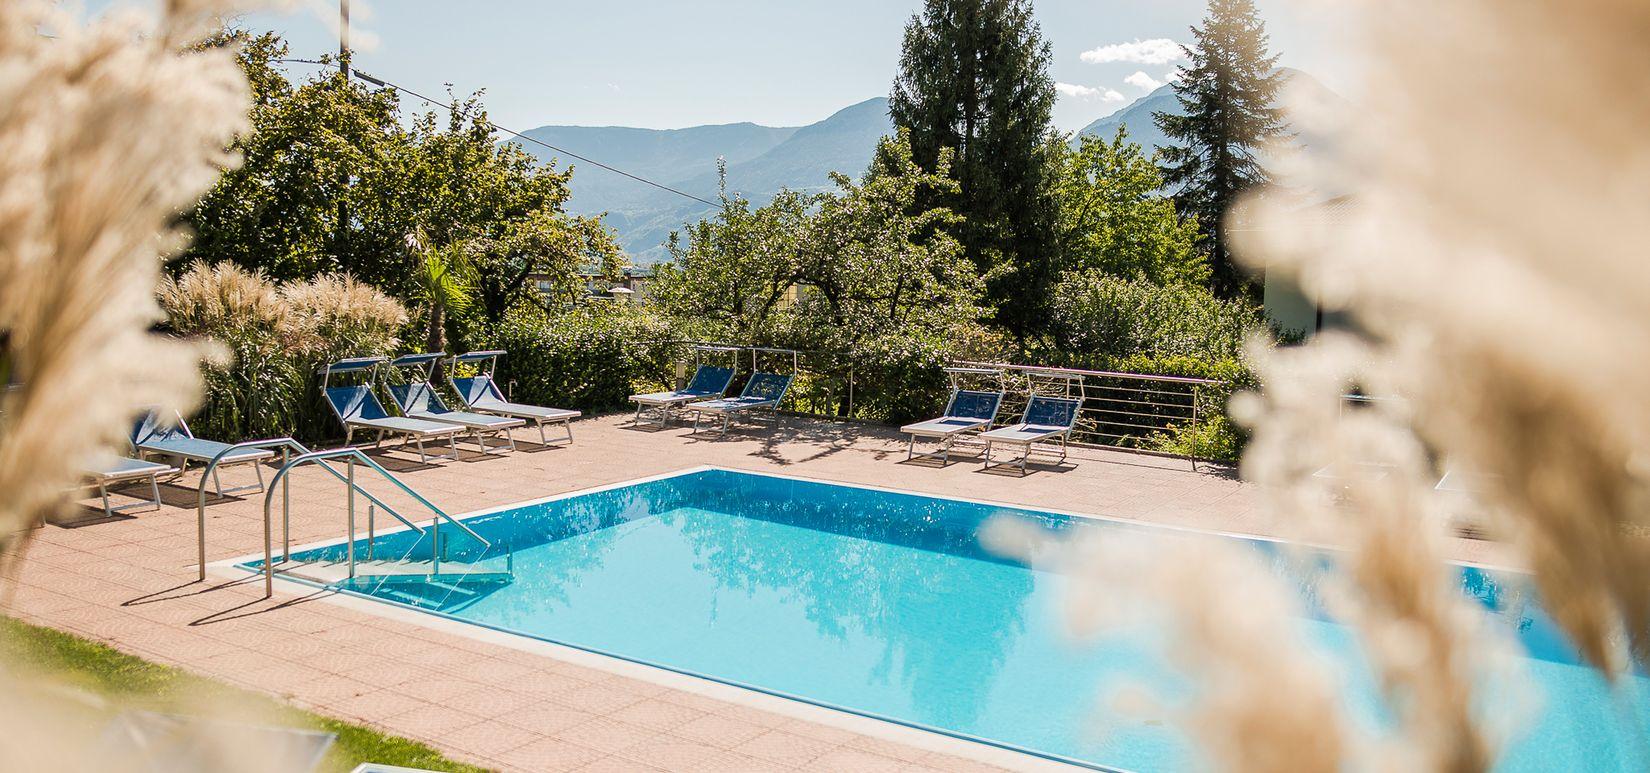 Hotel salgart merano alto adige - Hotel merano 4 stelle con piscina ...